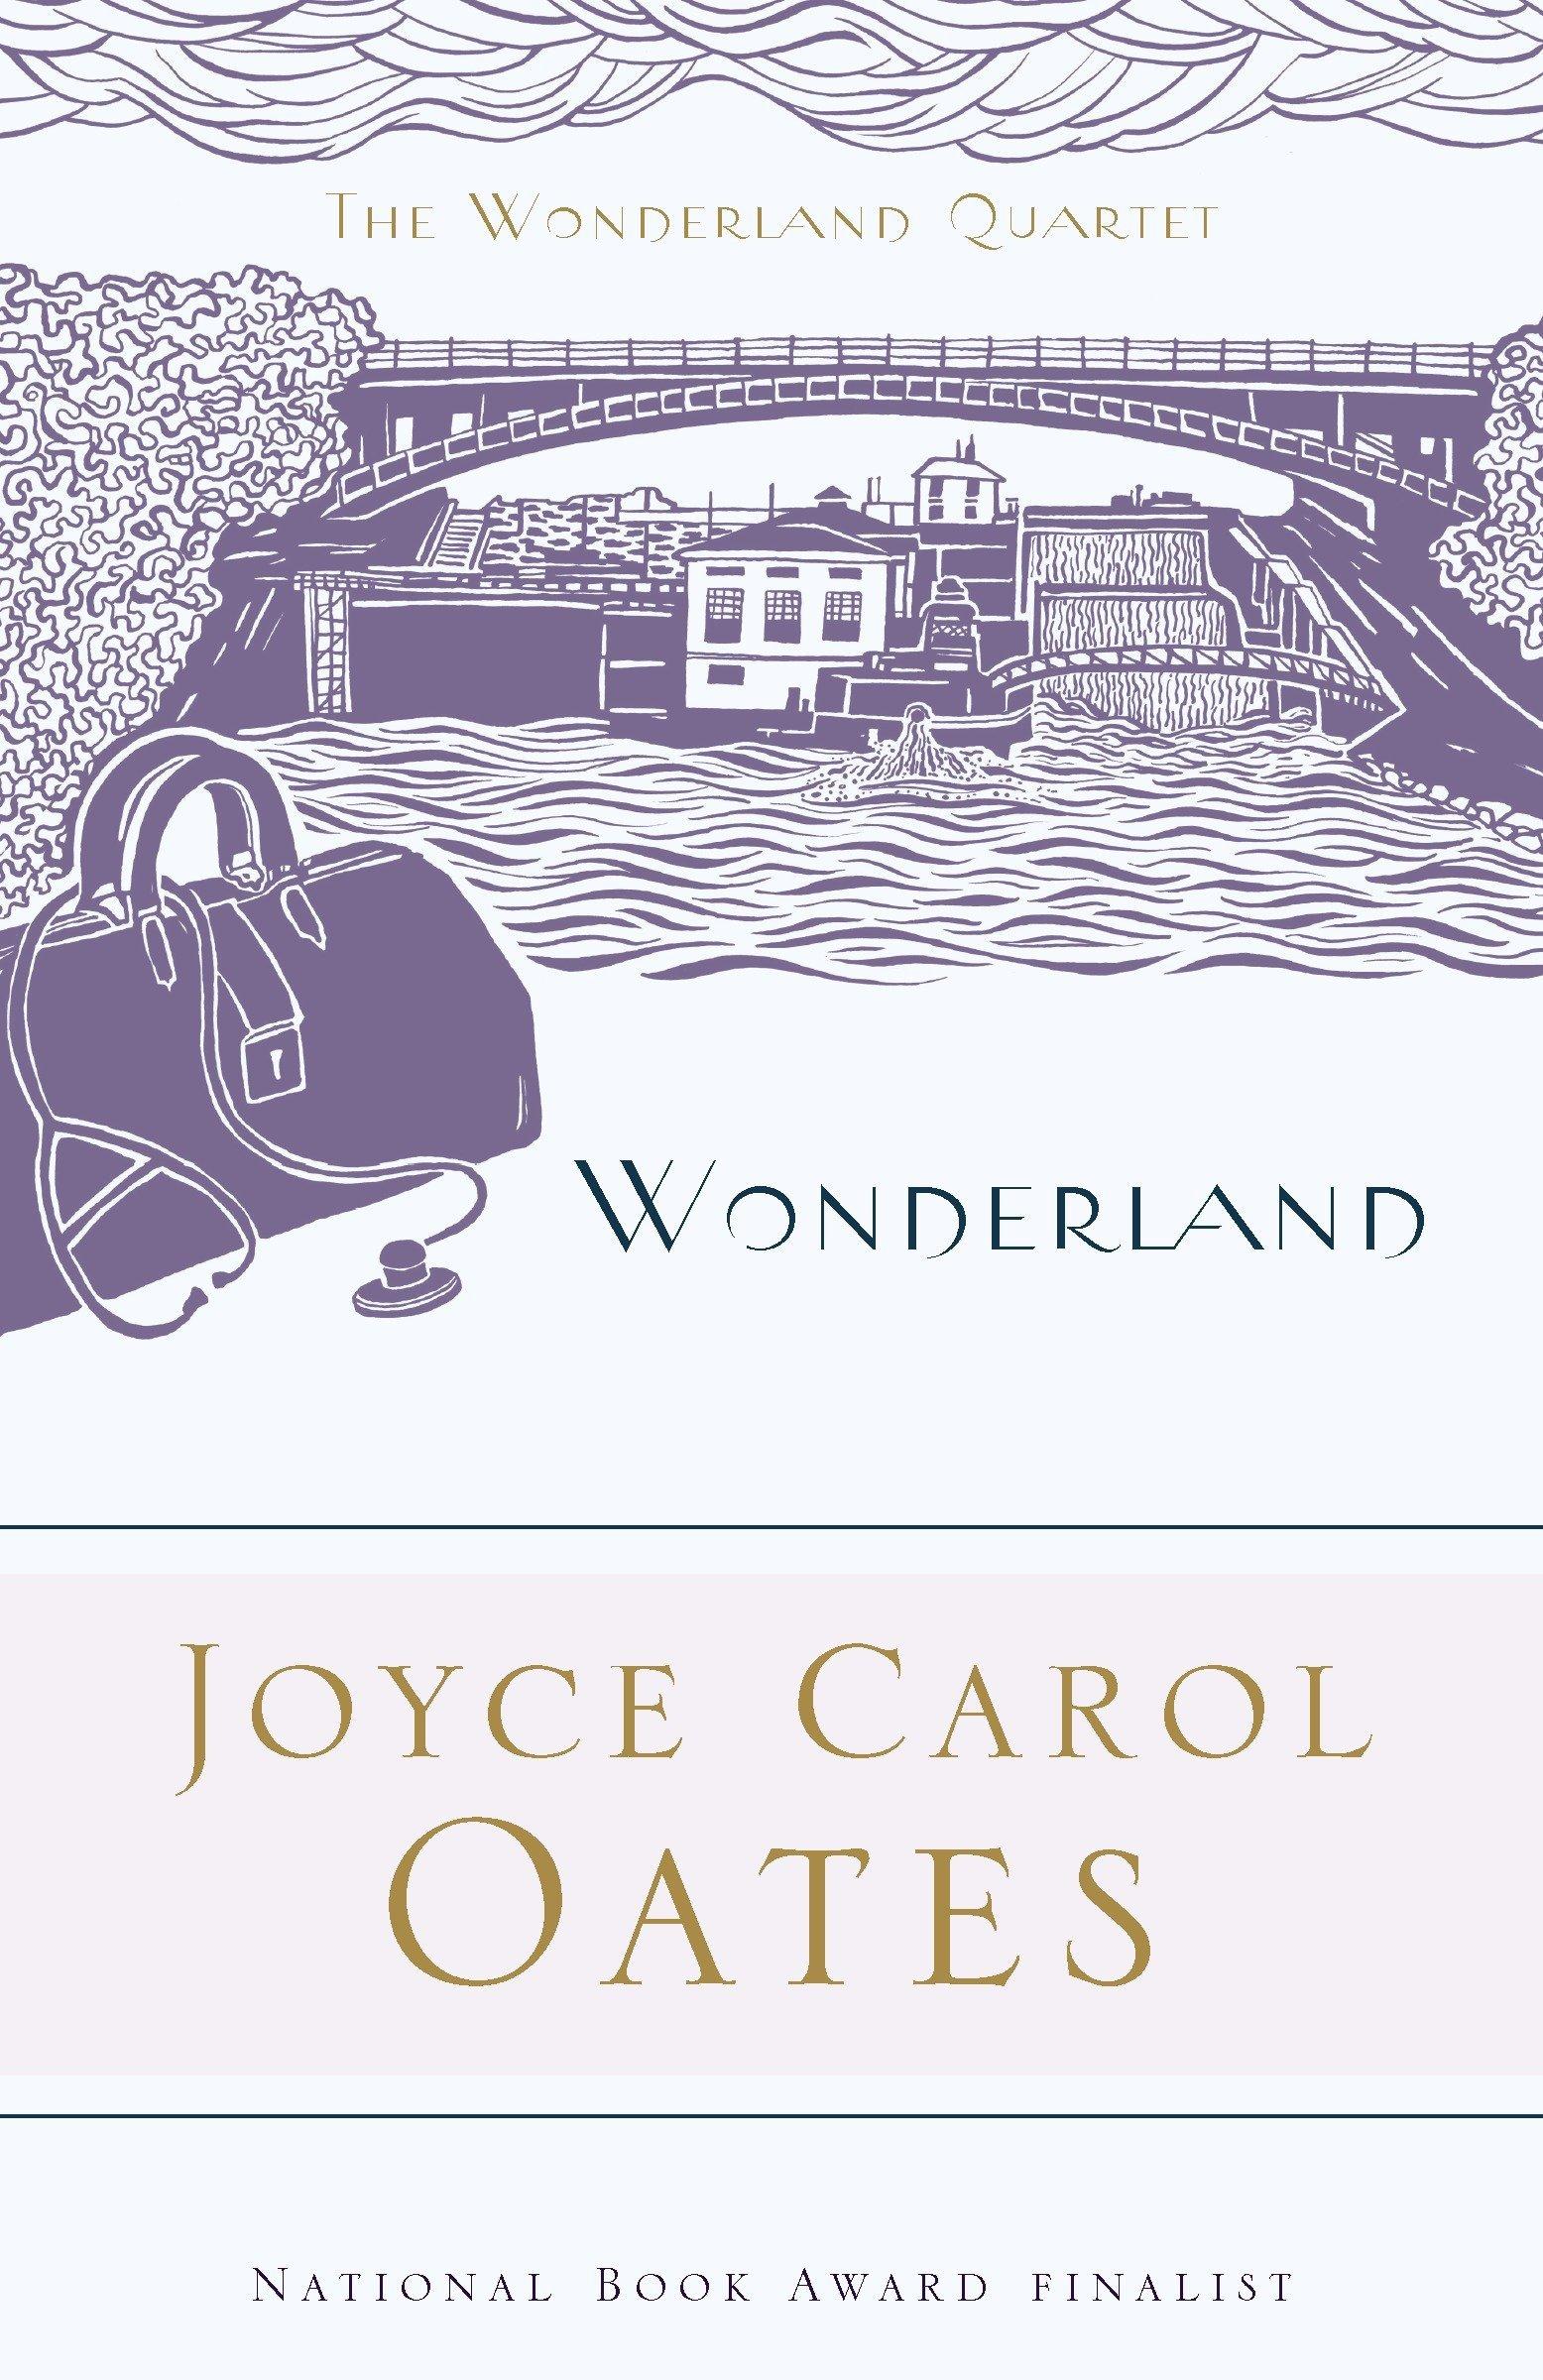 joyce carol oates shopping full text